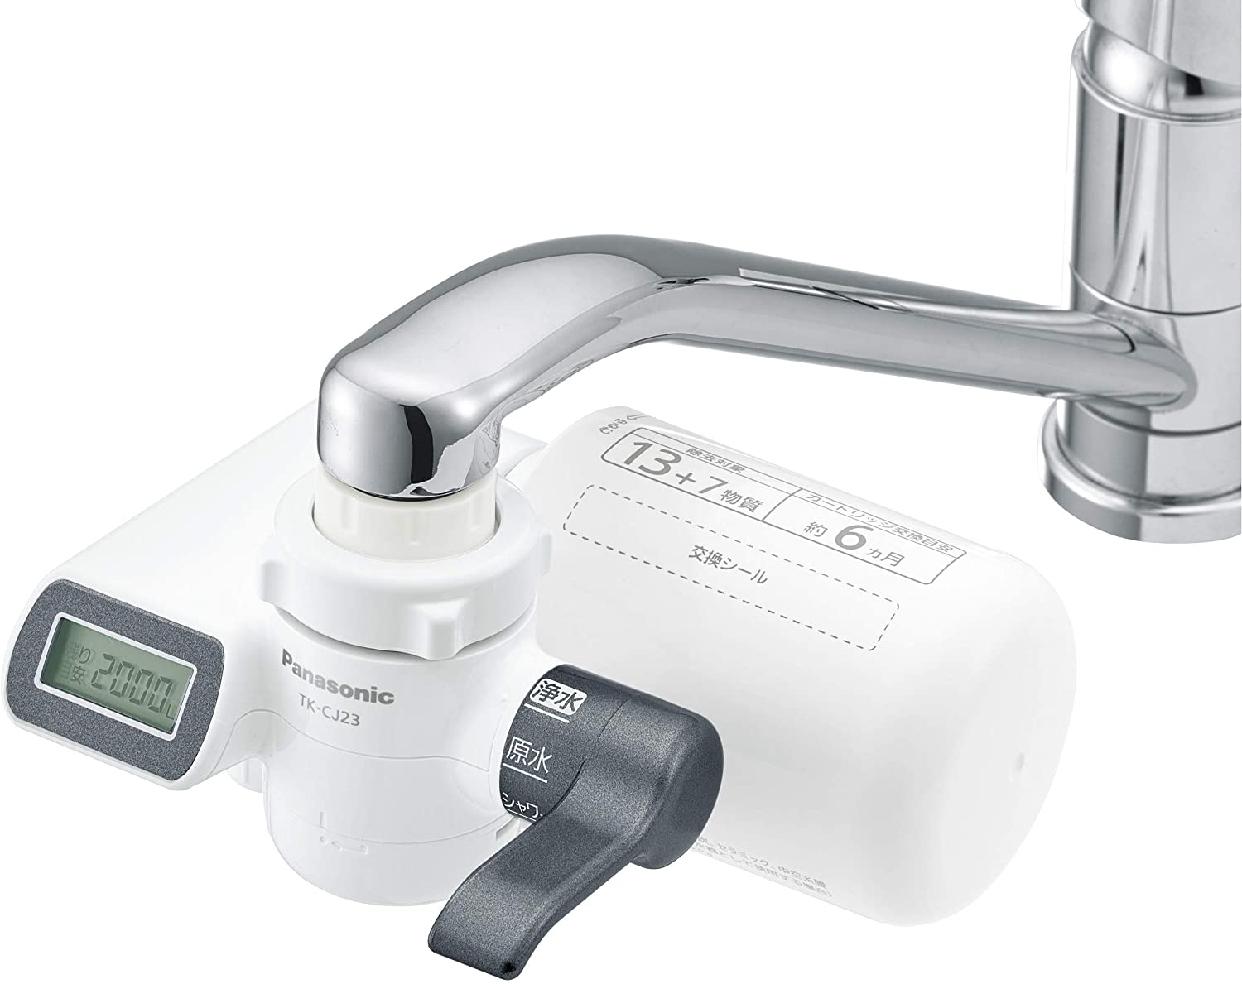 Panasonic(パナソニック)浄水器 TK-CJ23の商品画像